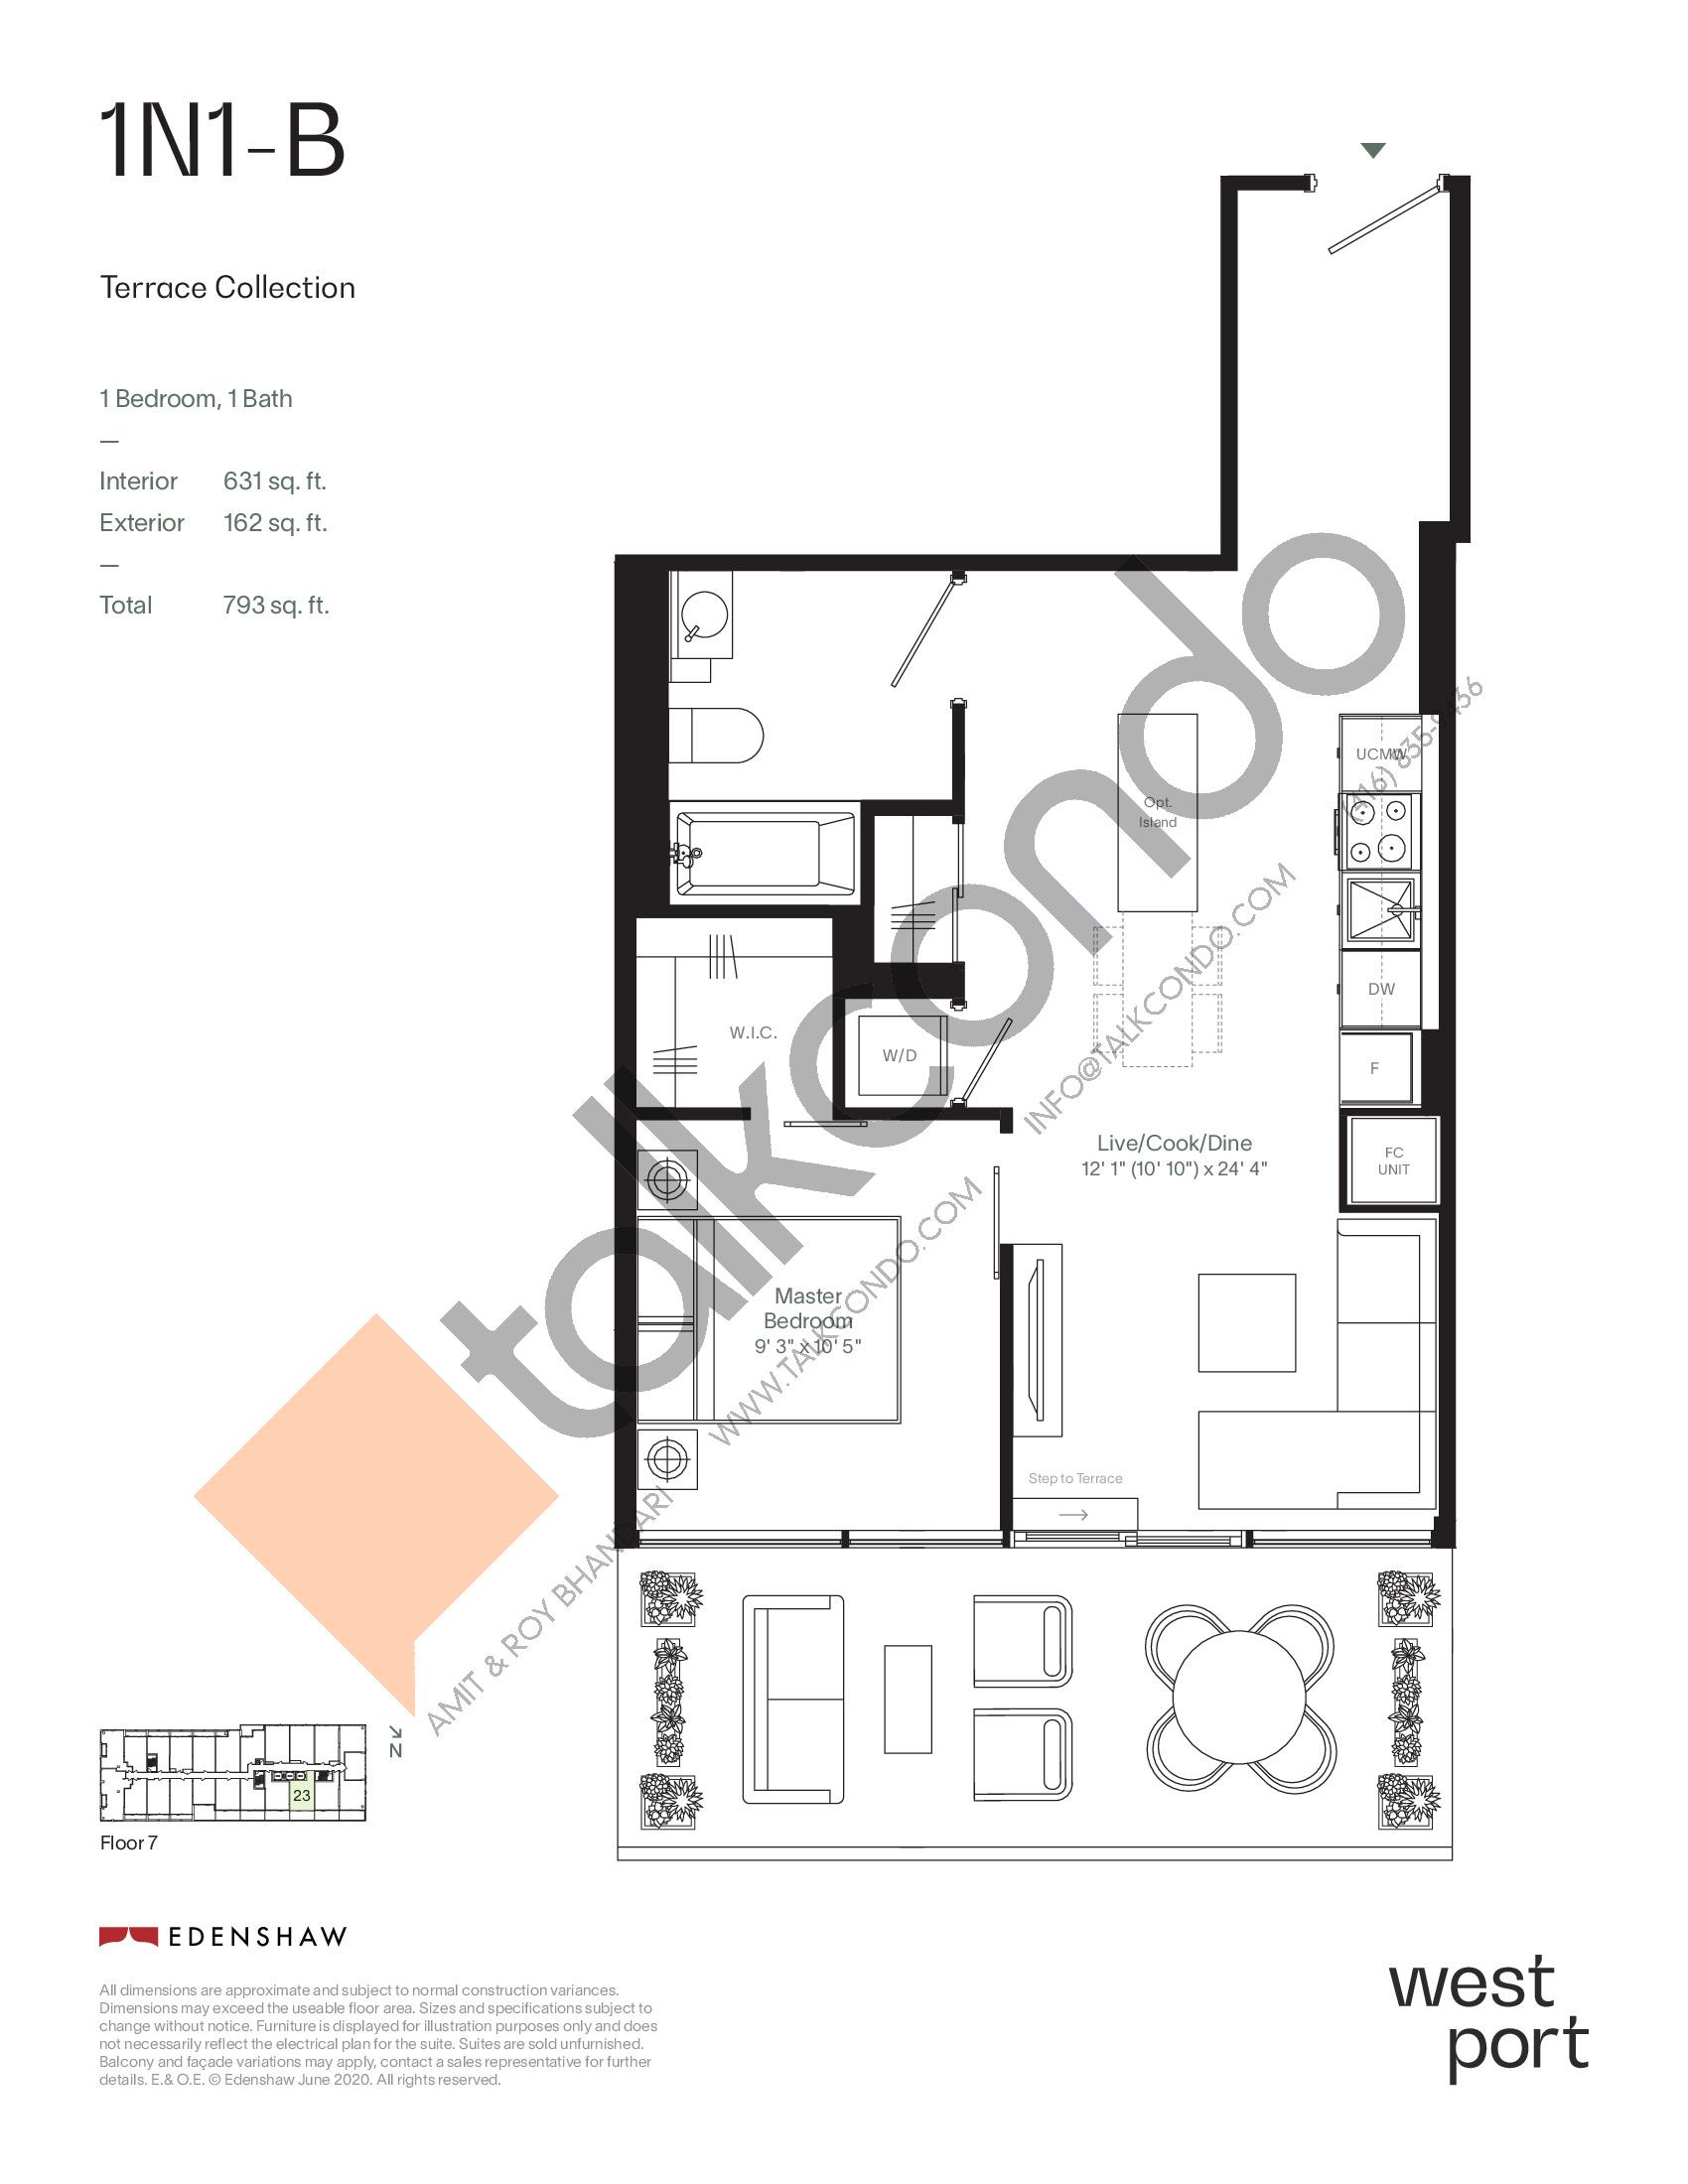 1N1-B - Terrace Collection Floor Plan at Westport Condos - 631 sq.ft